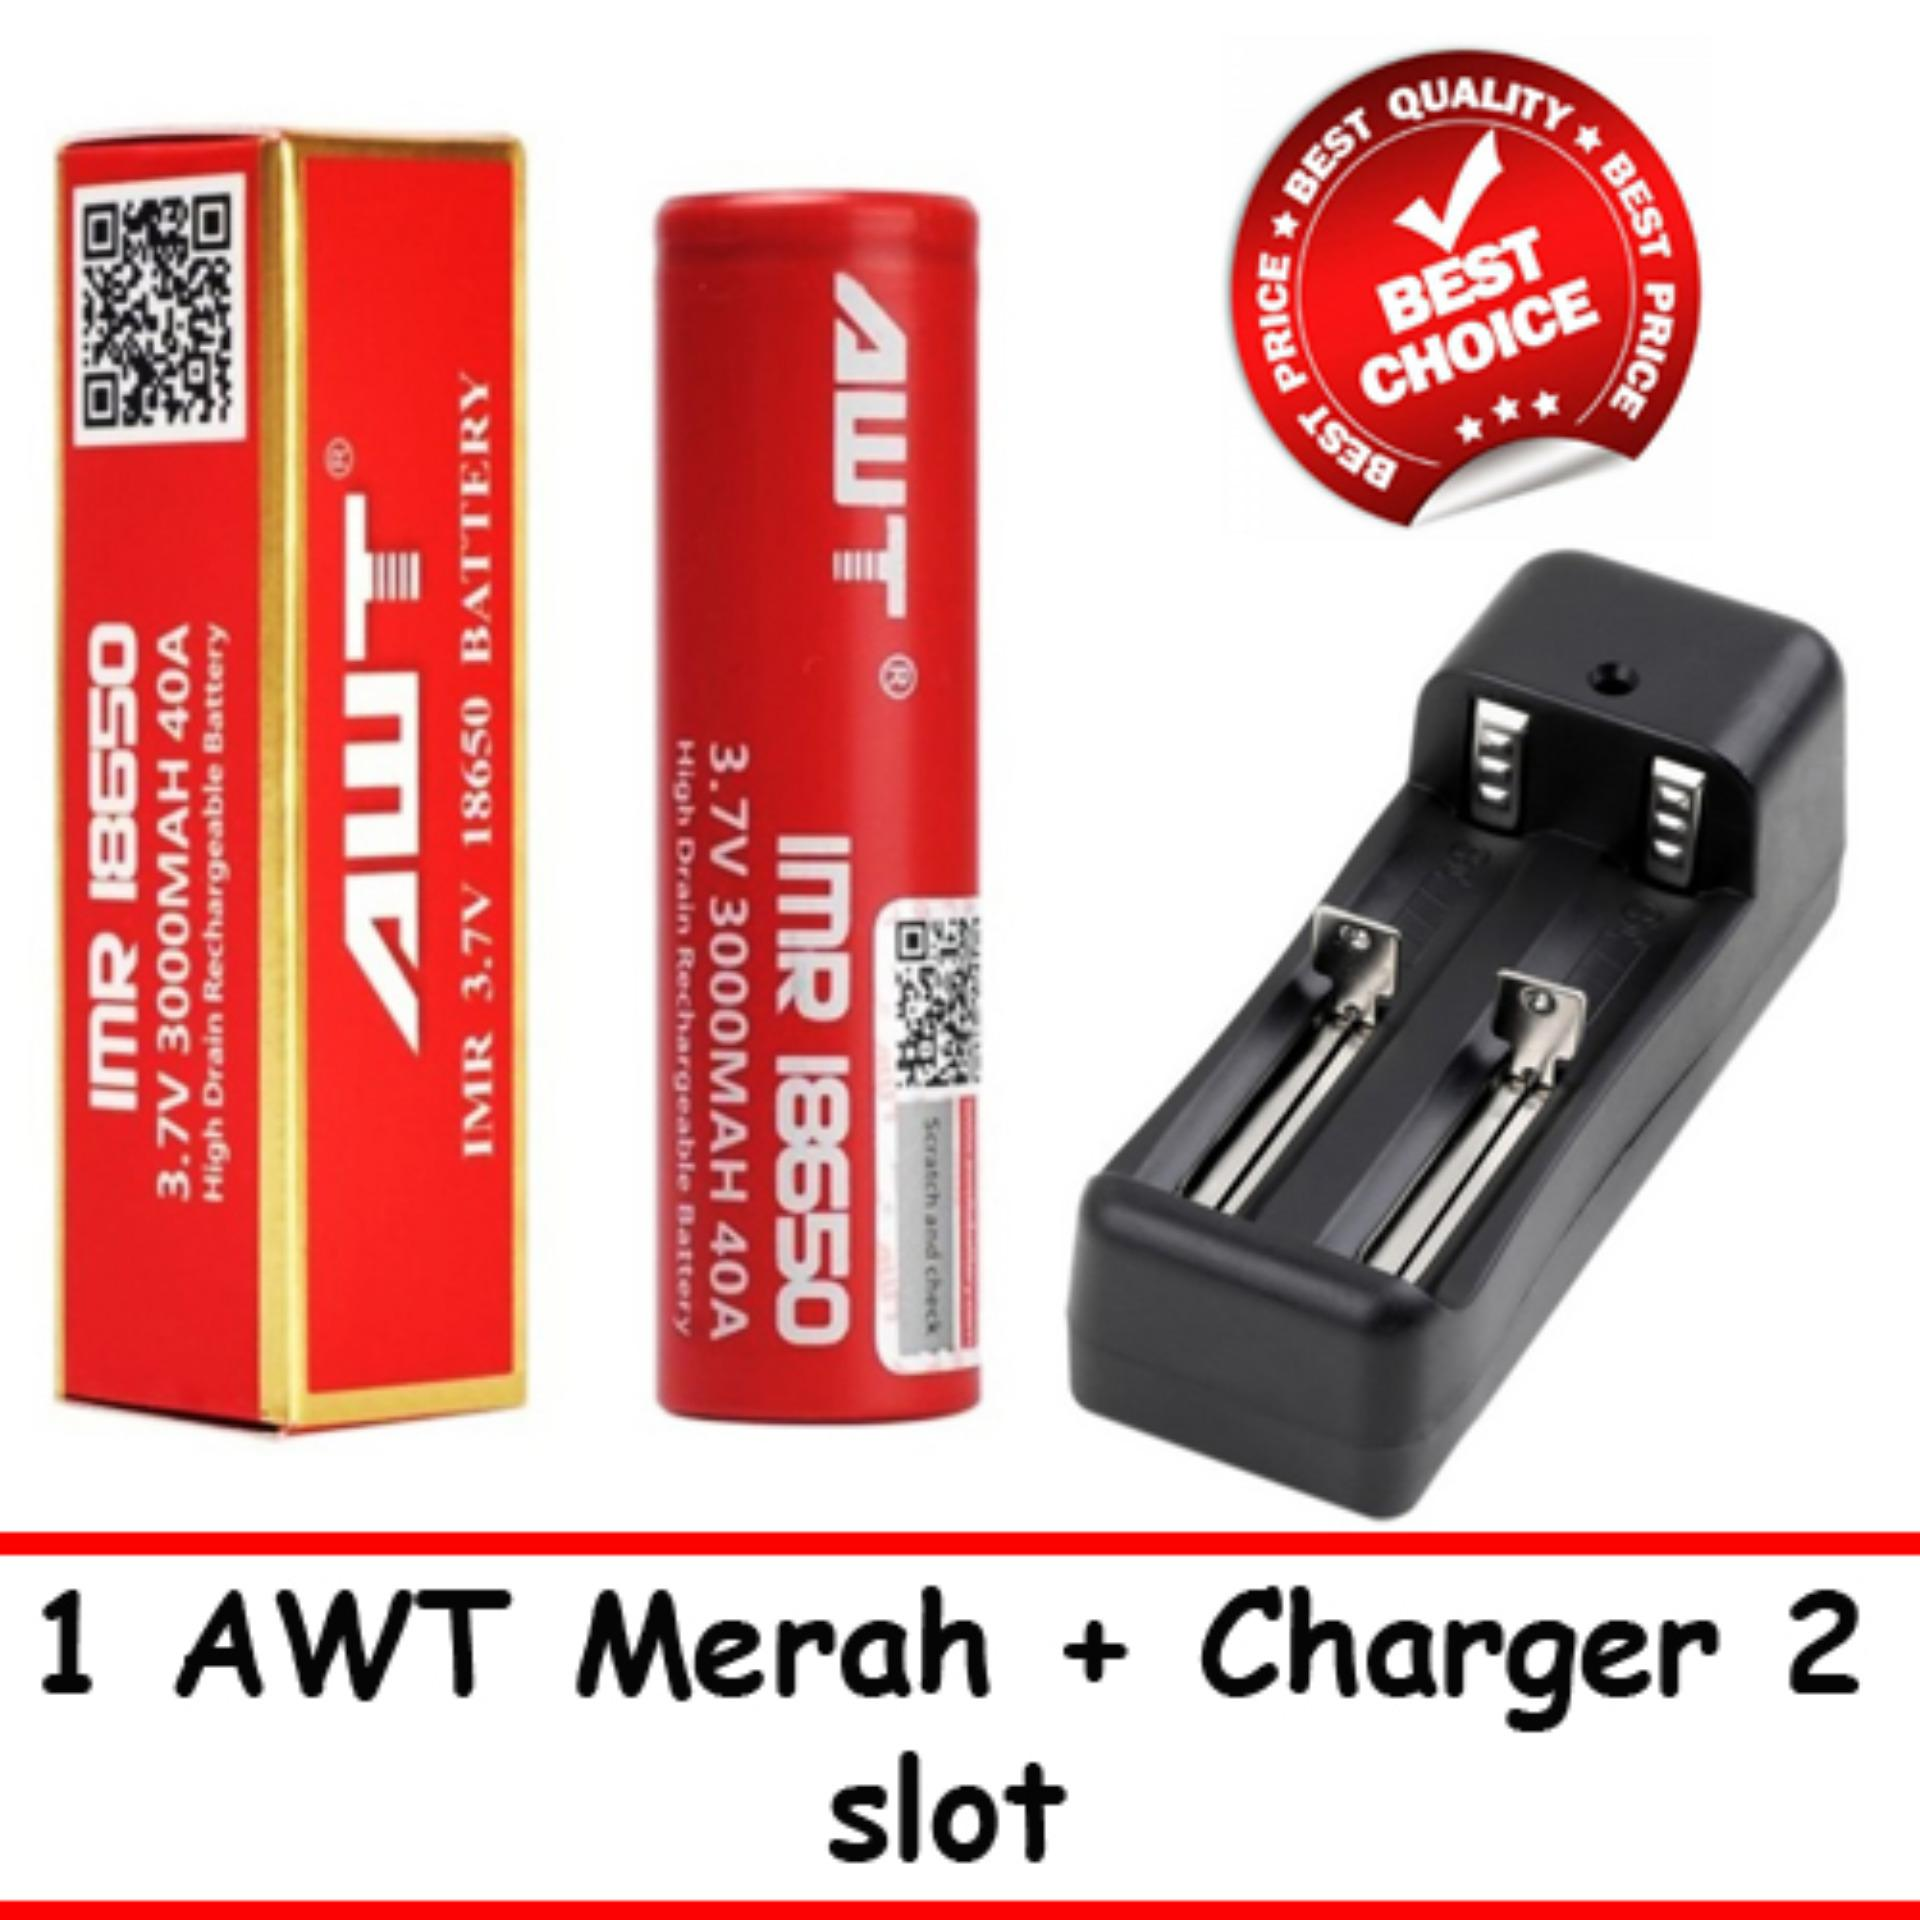 Cek Harga Baru Charger Baterai Desktop Single Slot Competyble Semua 1 Vape Awt 18650 37v Vapor Rokok Elektrik Rechargeable Li Ion